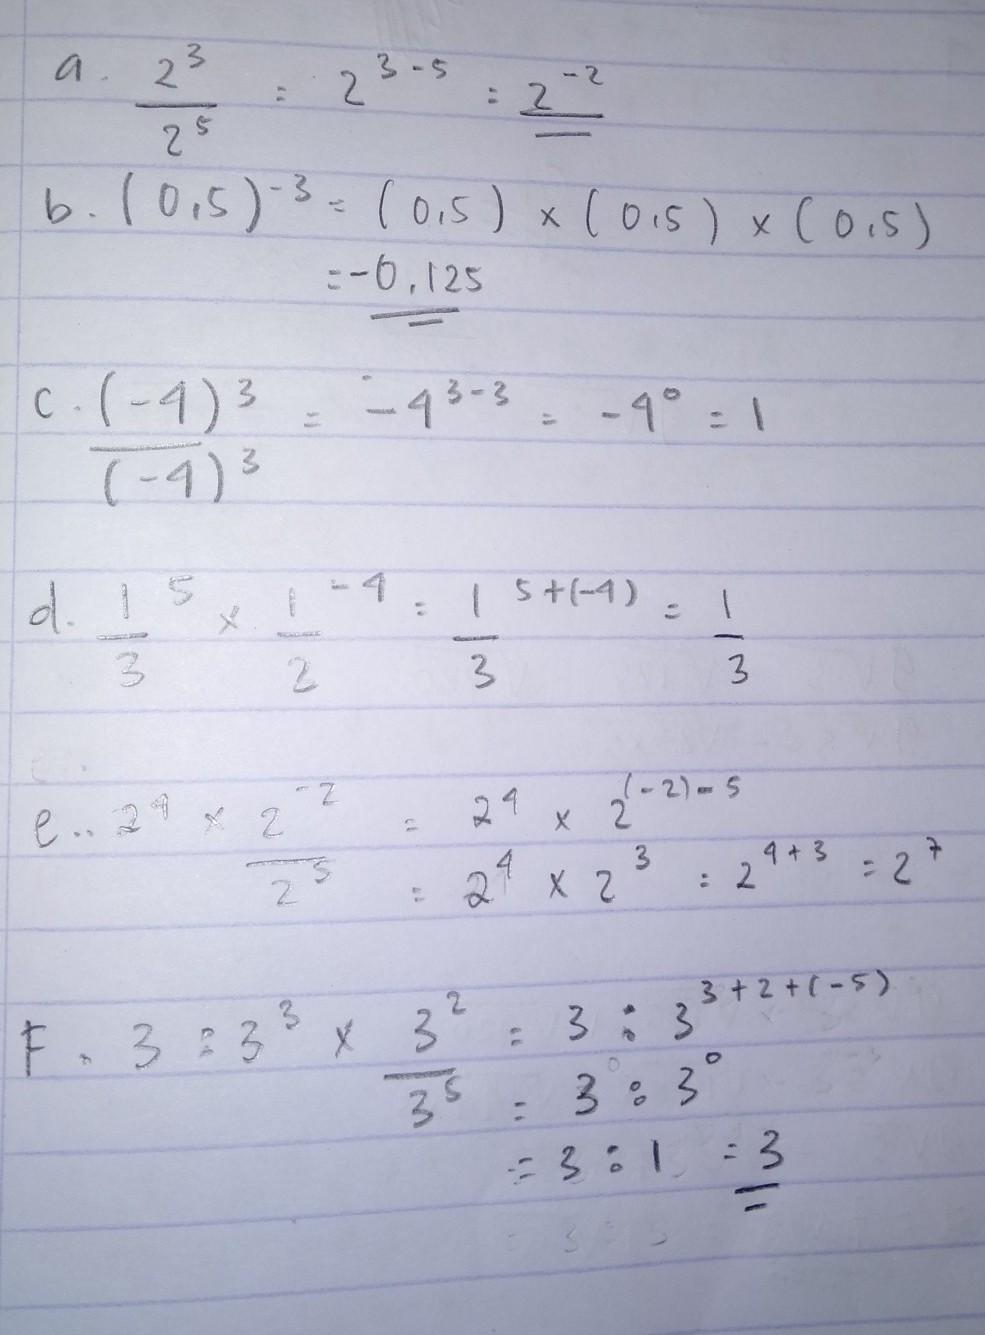 Sederhanakanlah Bentuk Pangkat Berikut : sederhanakanlah, bentuk, pangkat, berikut, Sederhanakan, Bentuk, Pangkat, Berikut., 2³/2⁵, (0,5)⁻³, (-4)³/(-4)³, 1/3⁵ₓ, 1/3⁻⁴, 2⁴ₓ, Brainly.co.id